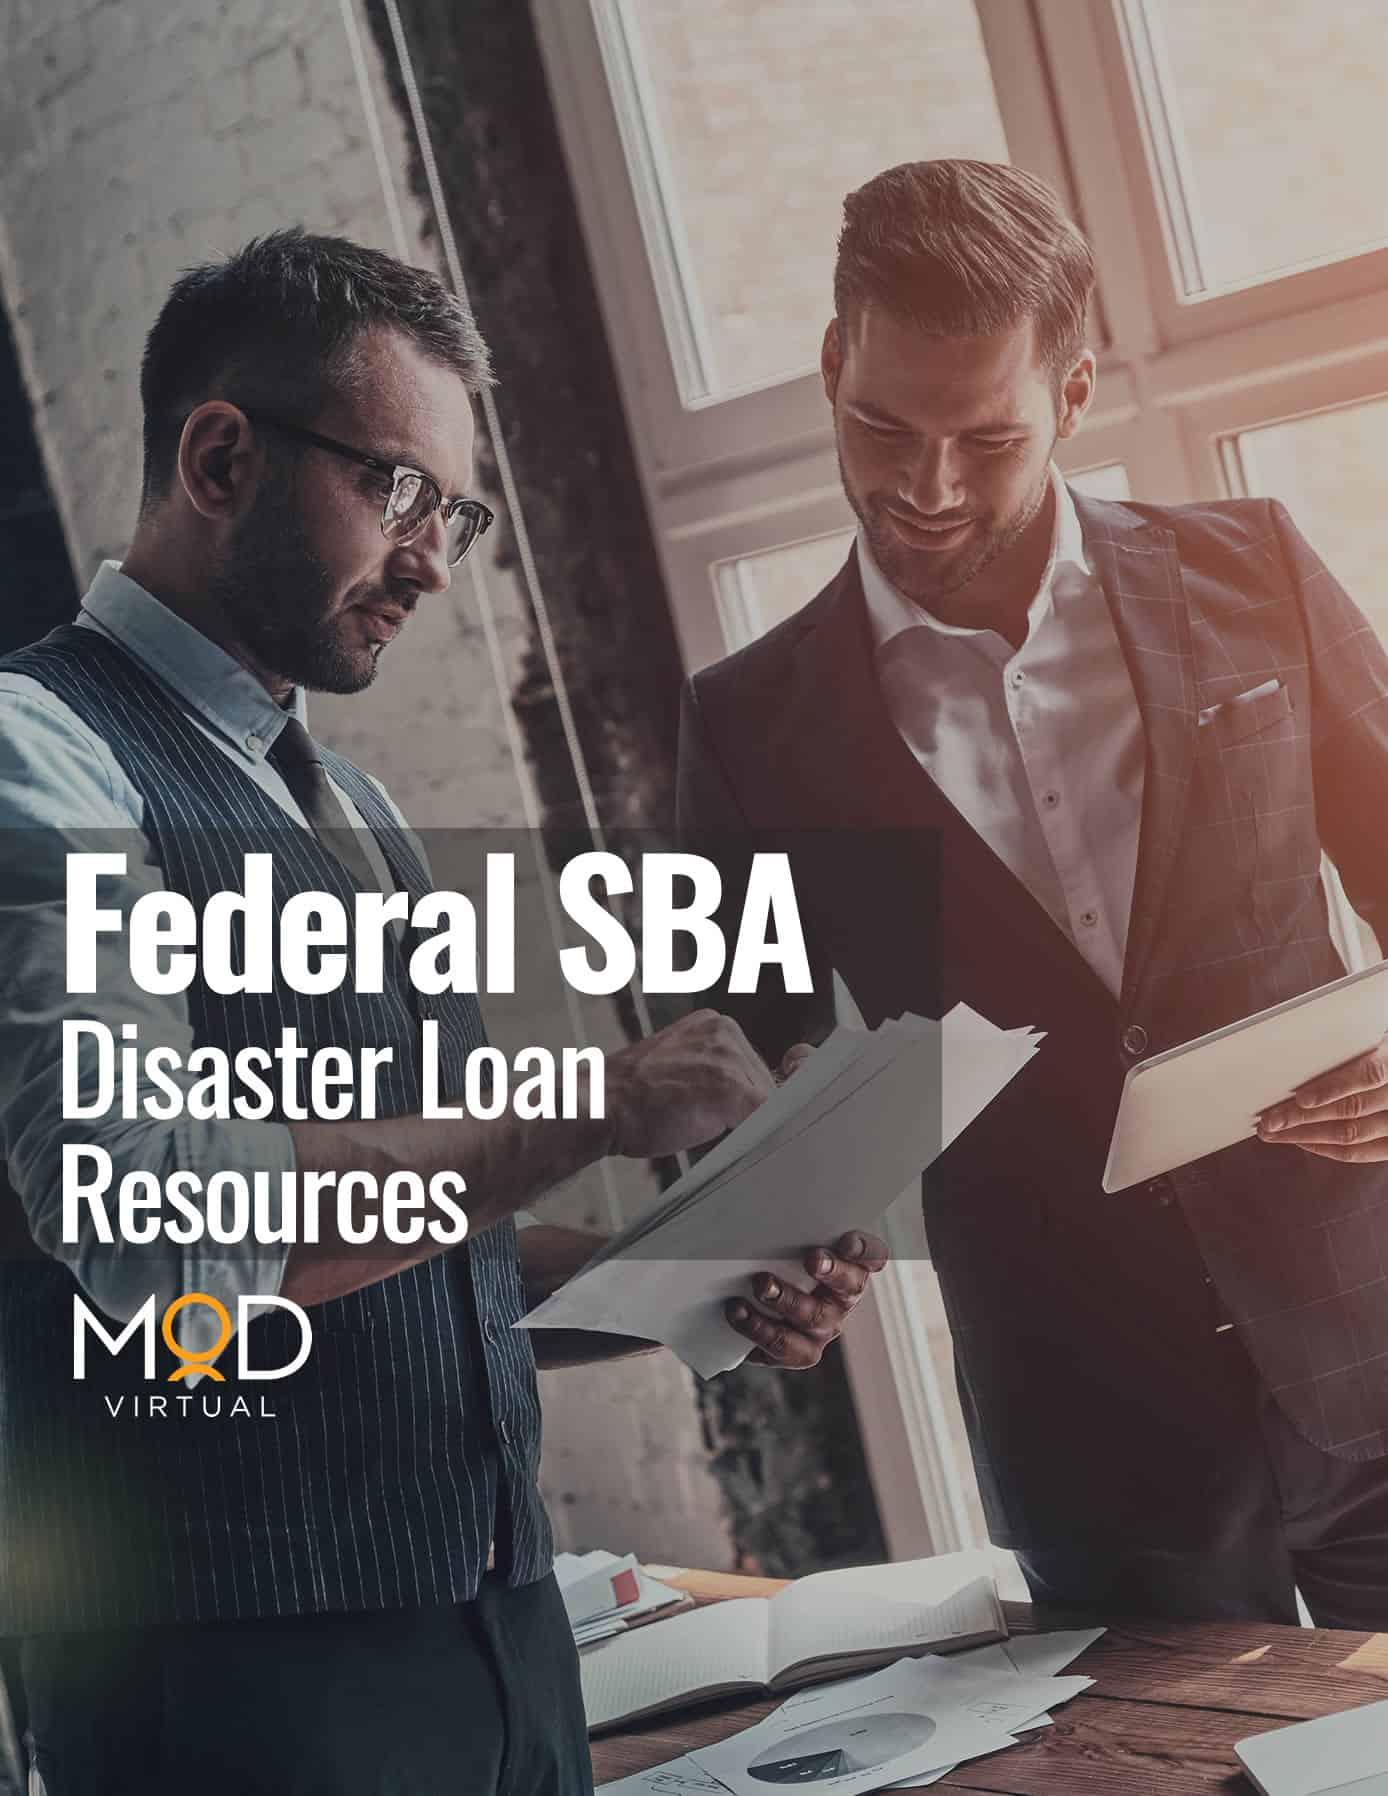 federal SBA disaster loan resources myoutdesk